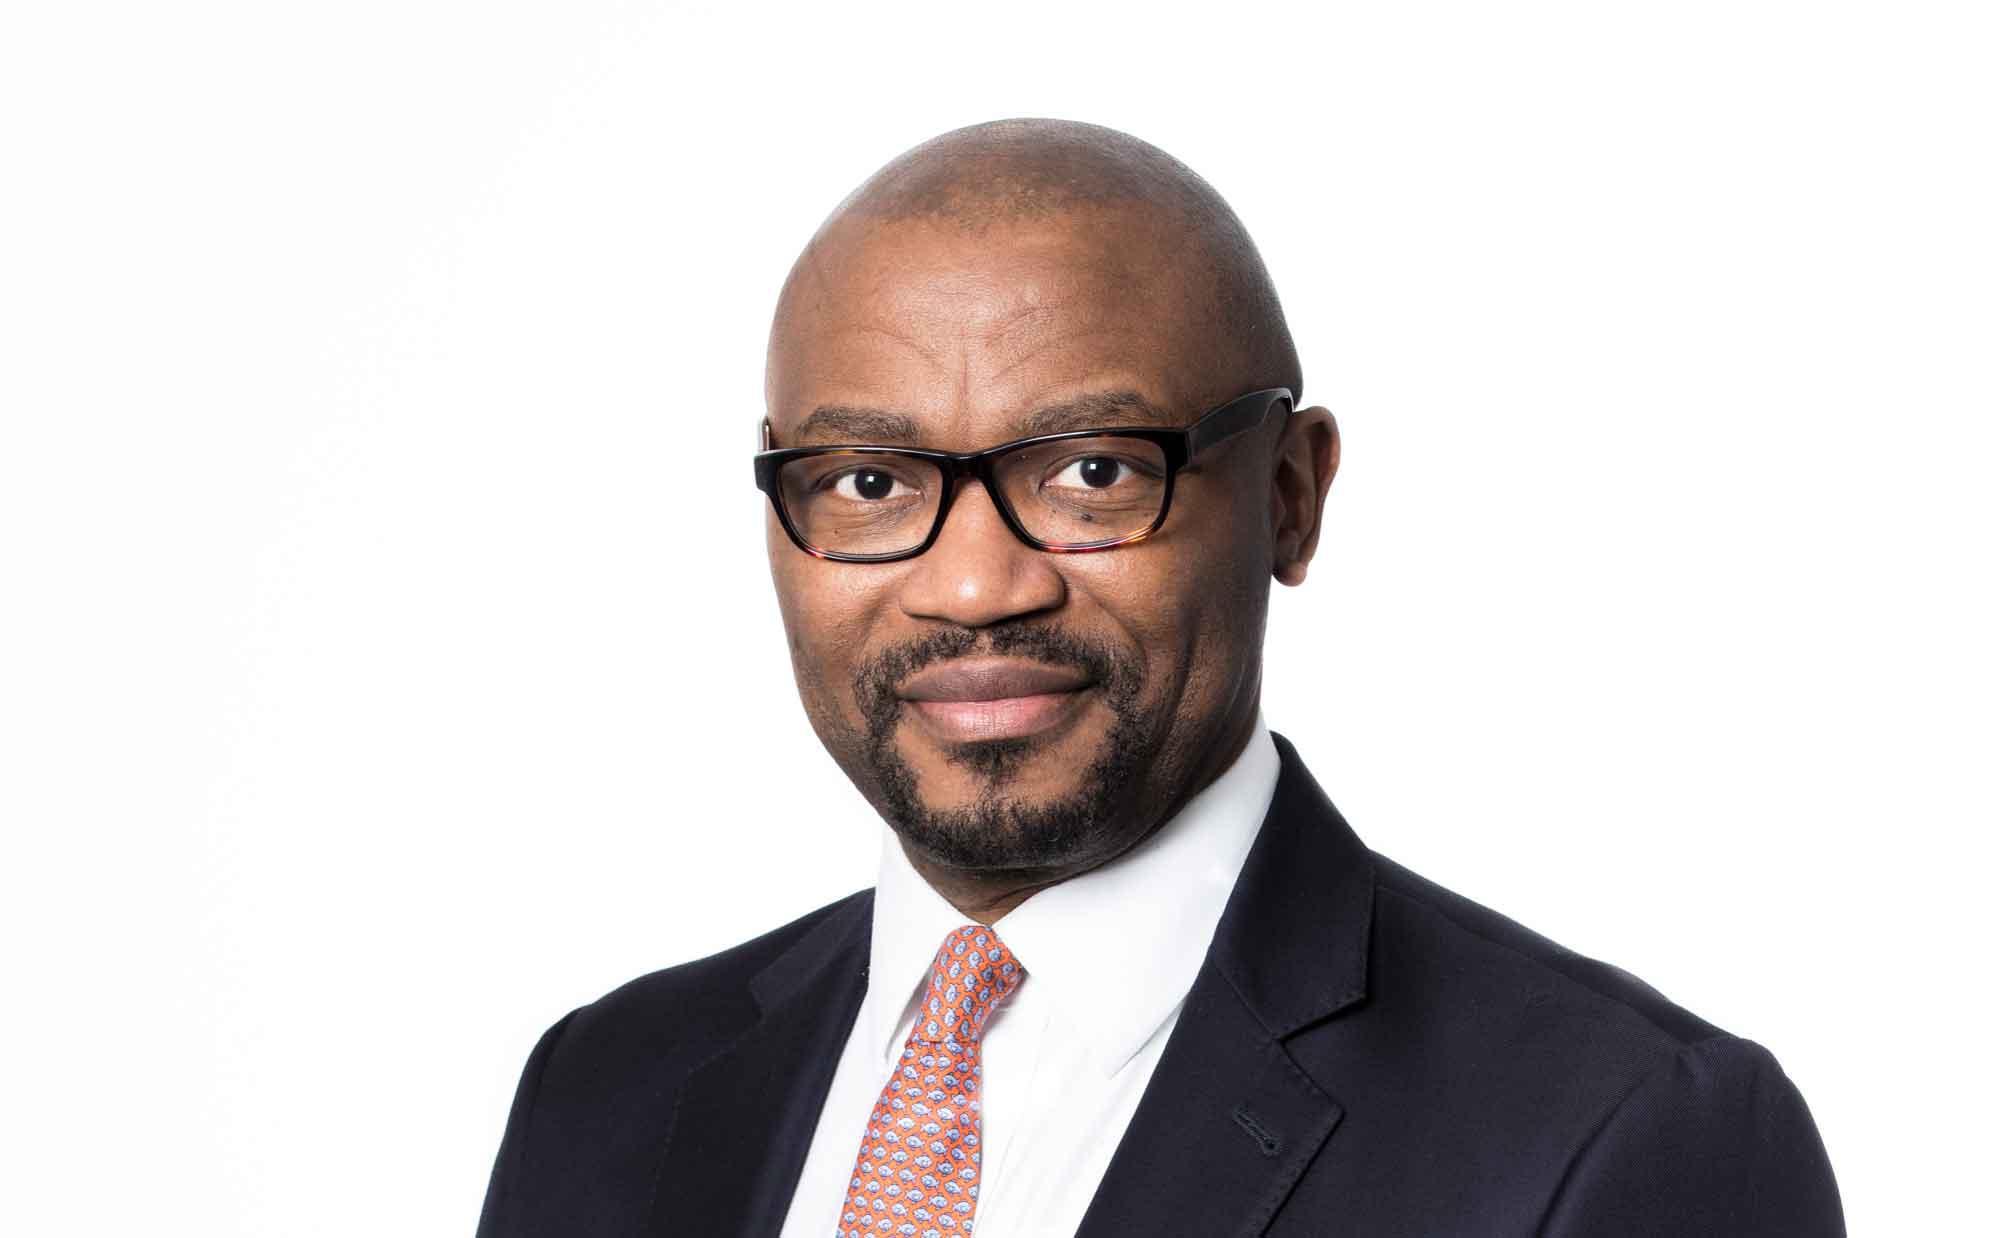 Guest Speaker, Marcel Mballa-Ekobena, to Discuss Business Resiliency